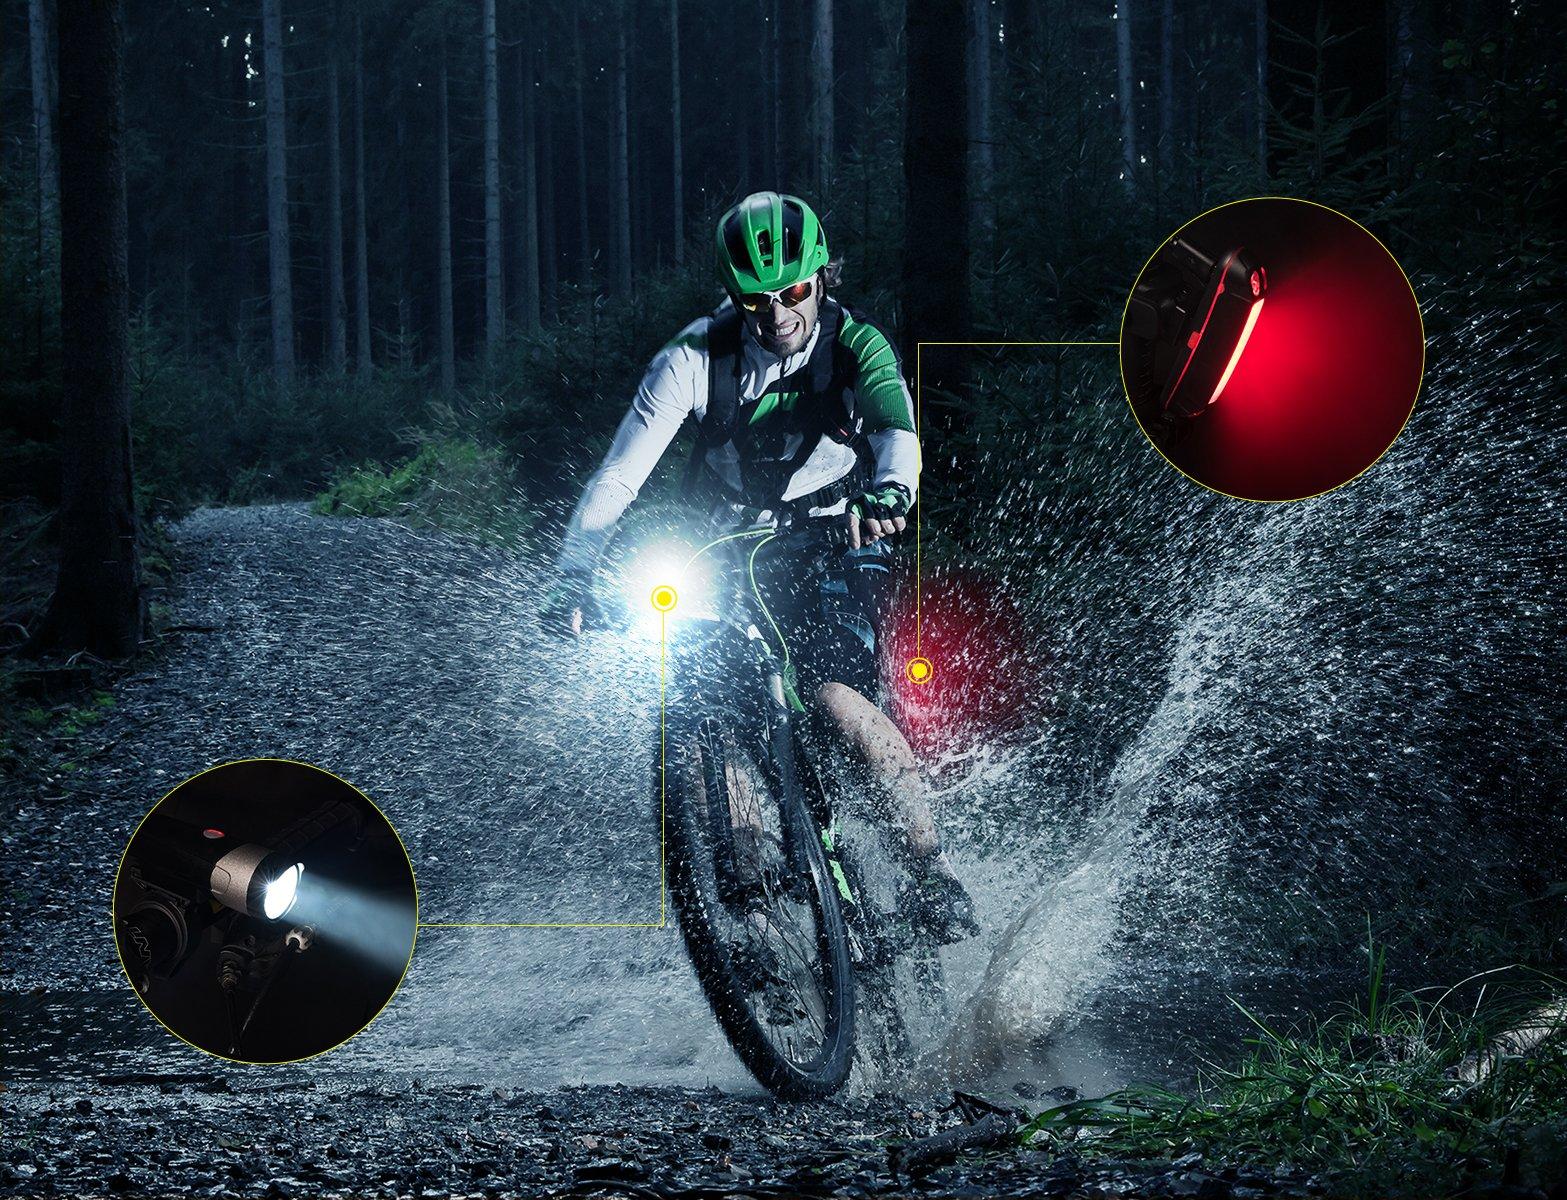 Taktik Super Bright Bike Lights Set Rechargeable - Safety 500 Lumens Front and Back Bicycle Lights 2000 mAh Waterproof LED Bike Light For Bike,Road Bike,Mountain Bike,Light Bike Night Rider by Taktik (Image #7)